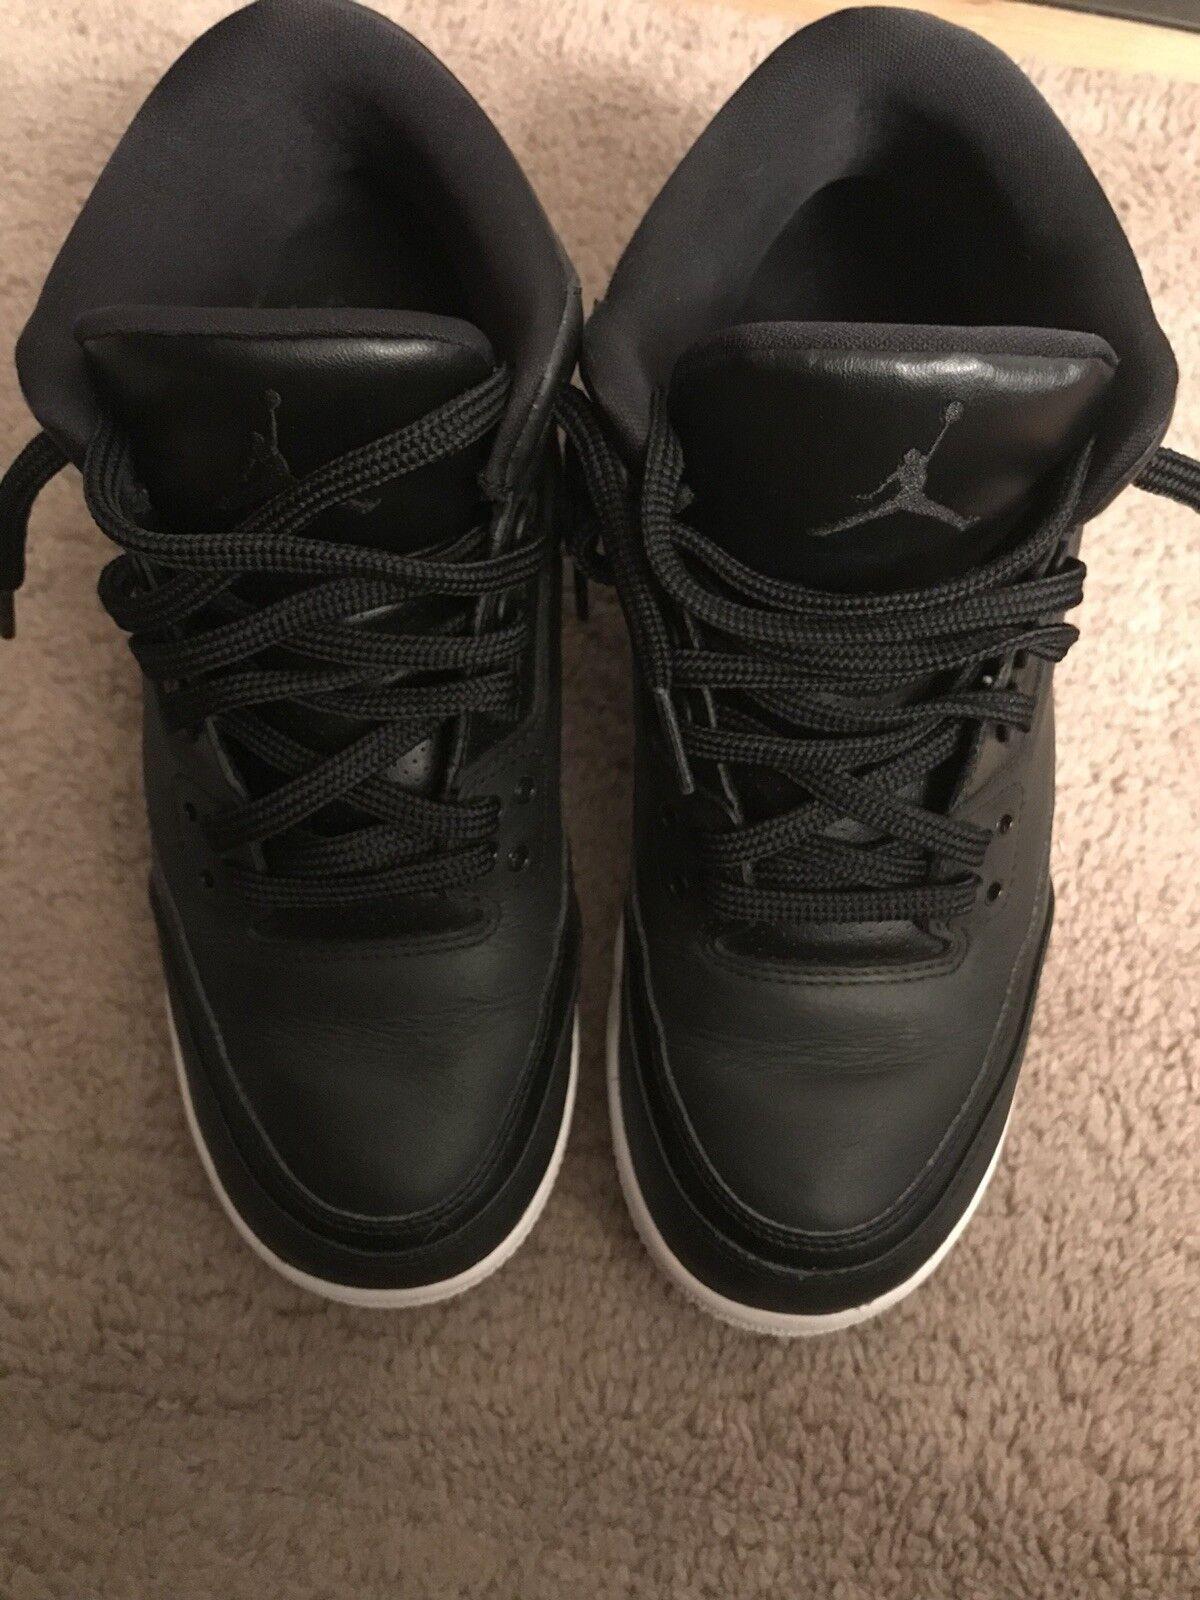 74d0b3d1ff7 Jordan 3 Cyber Monday VNDS Nike Air nxtjxy9666-Athletic Shoes